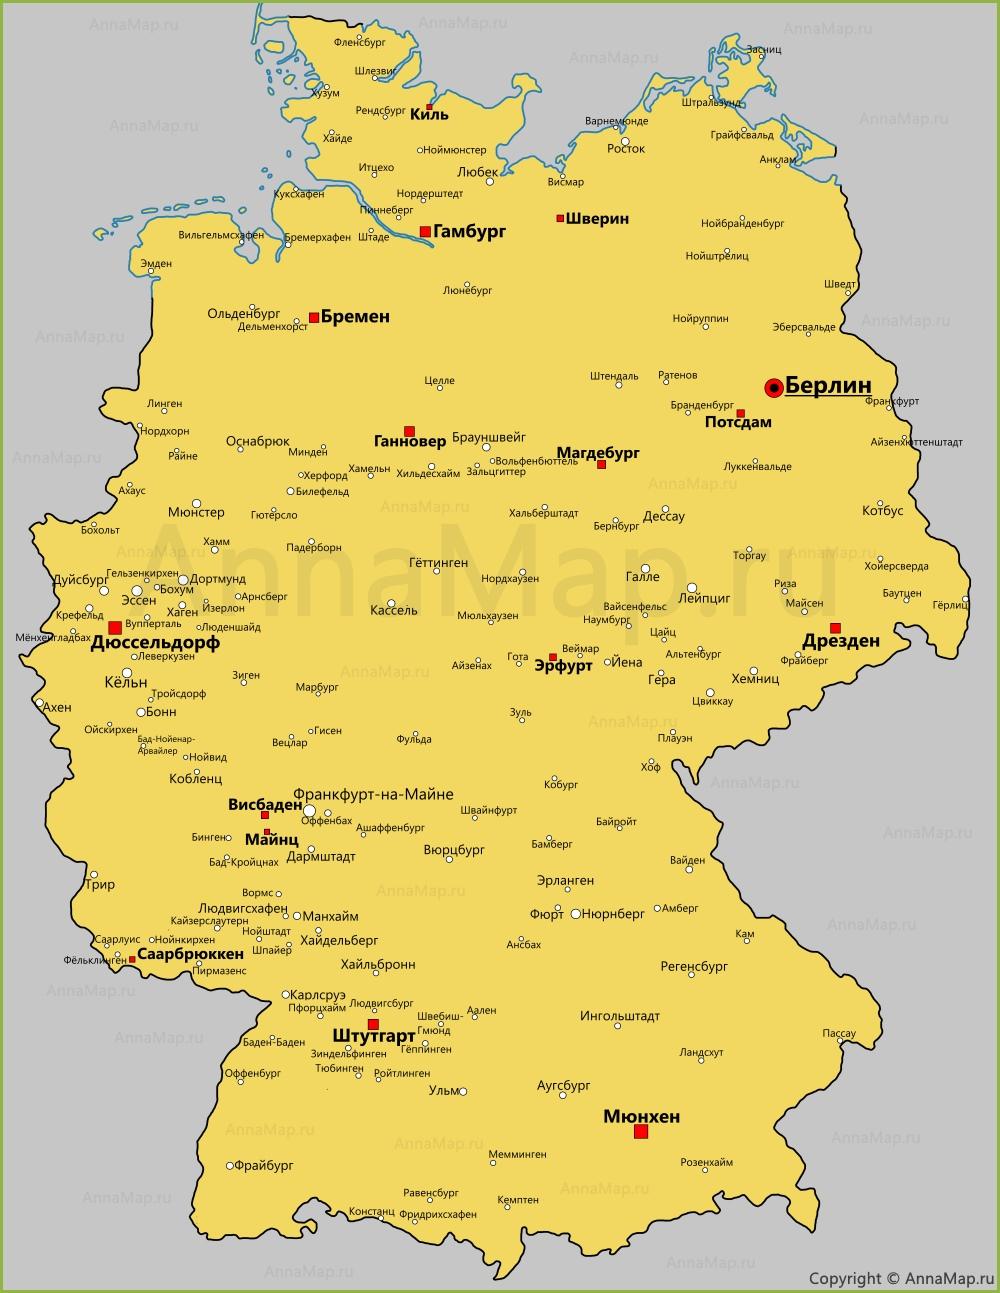 Goroda Germanii Na Karte Karta Germanii S Gorodami Annamap Ru